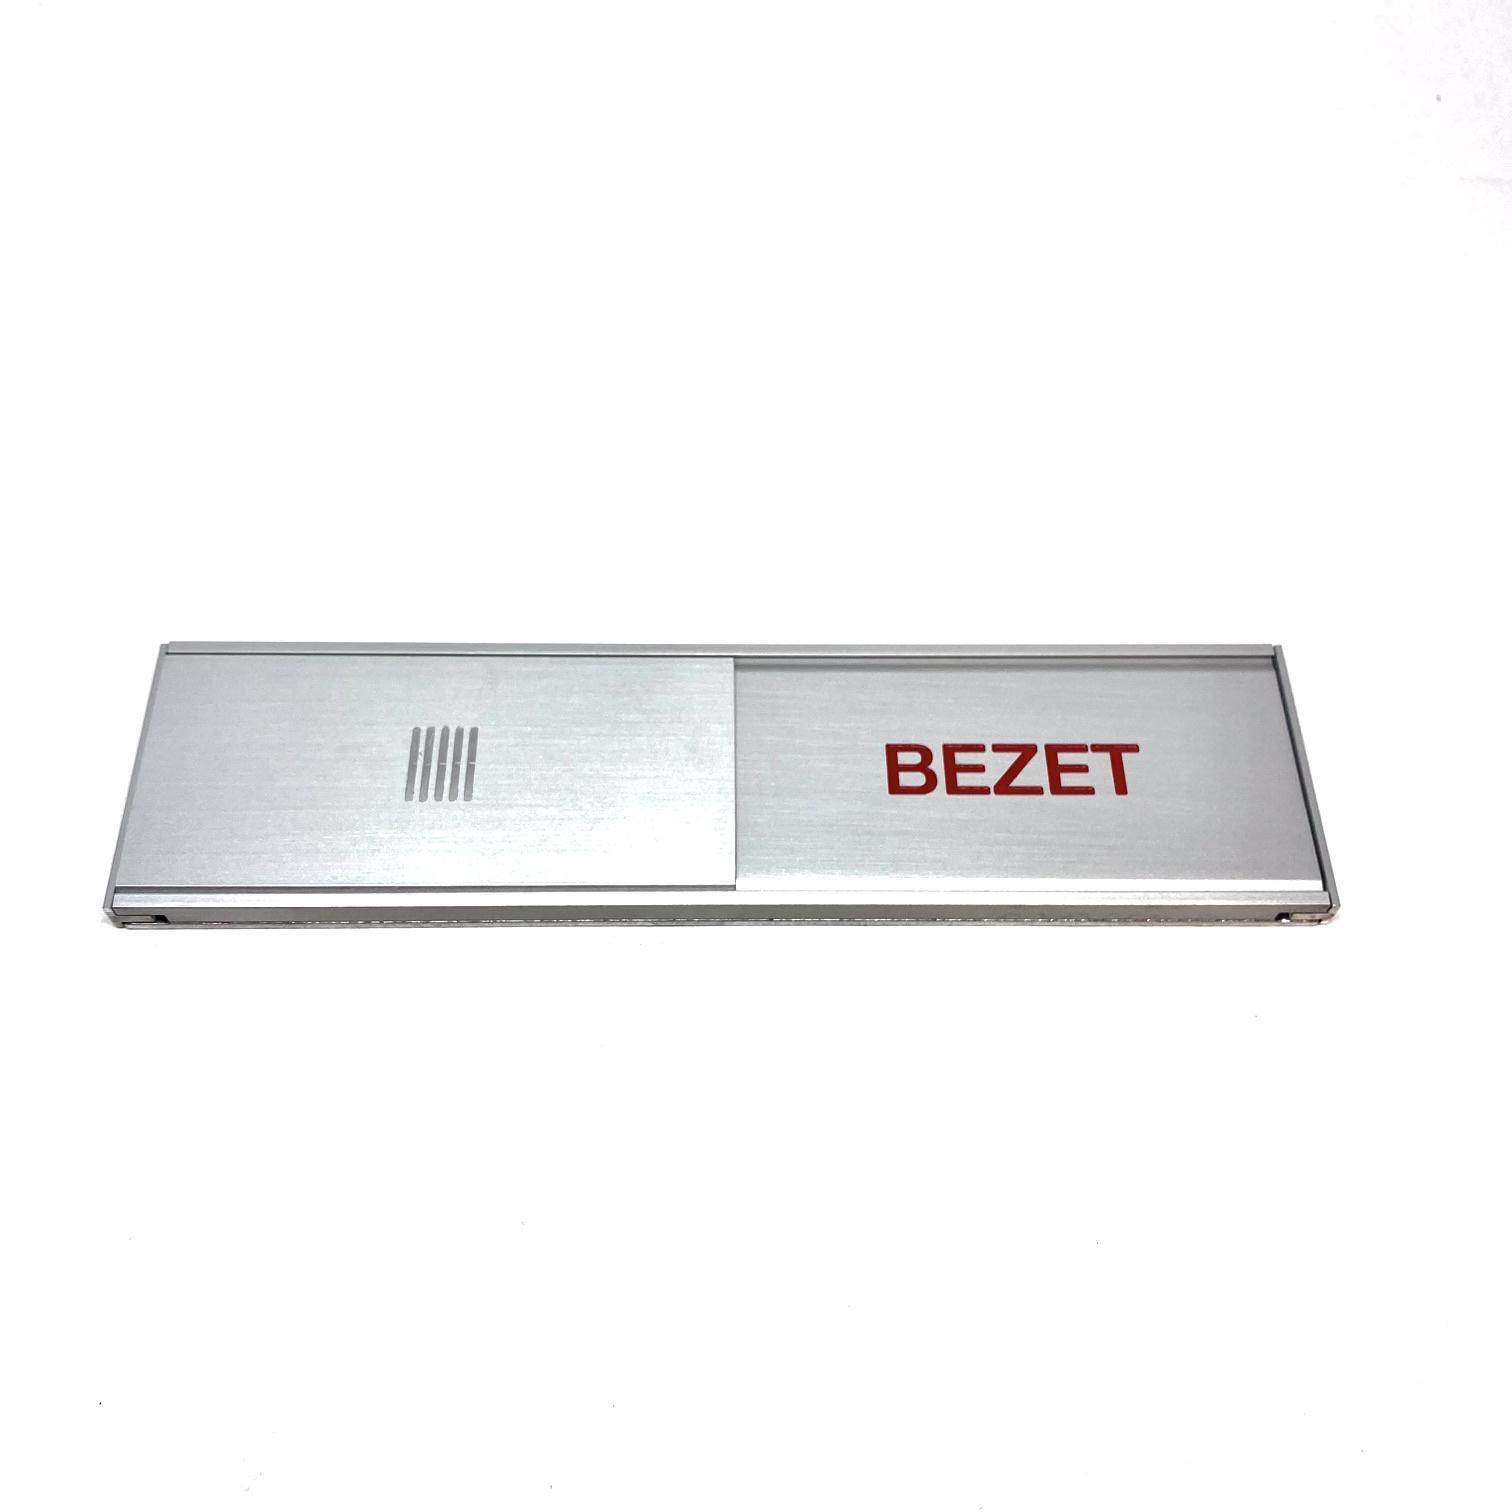 Schuifbordje aluminium VRIJ / BEZET